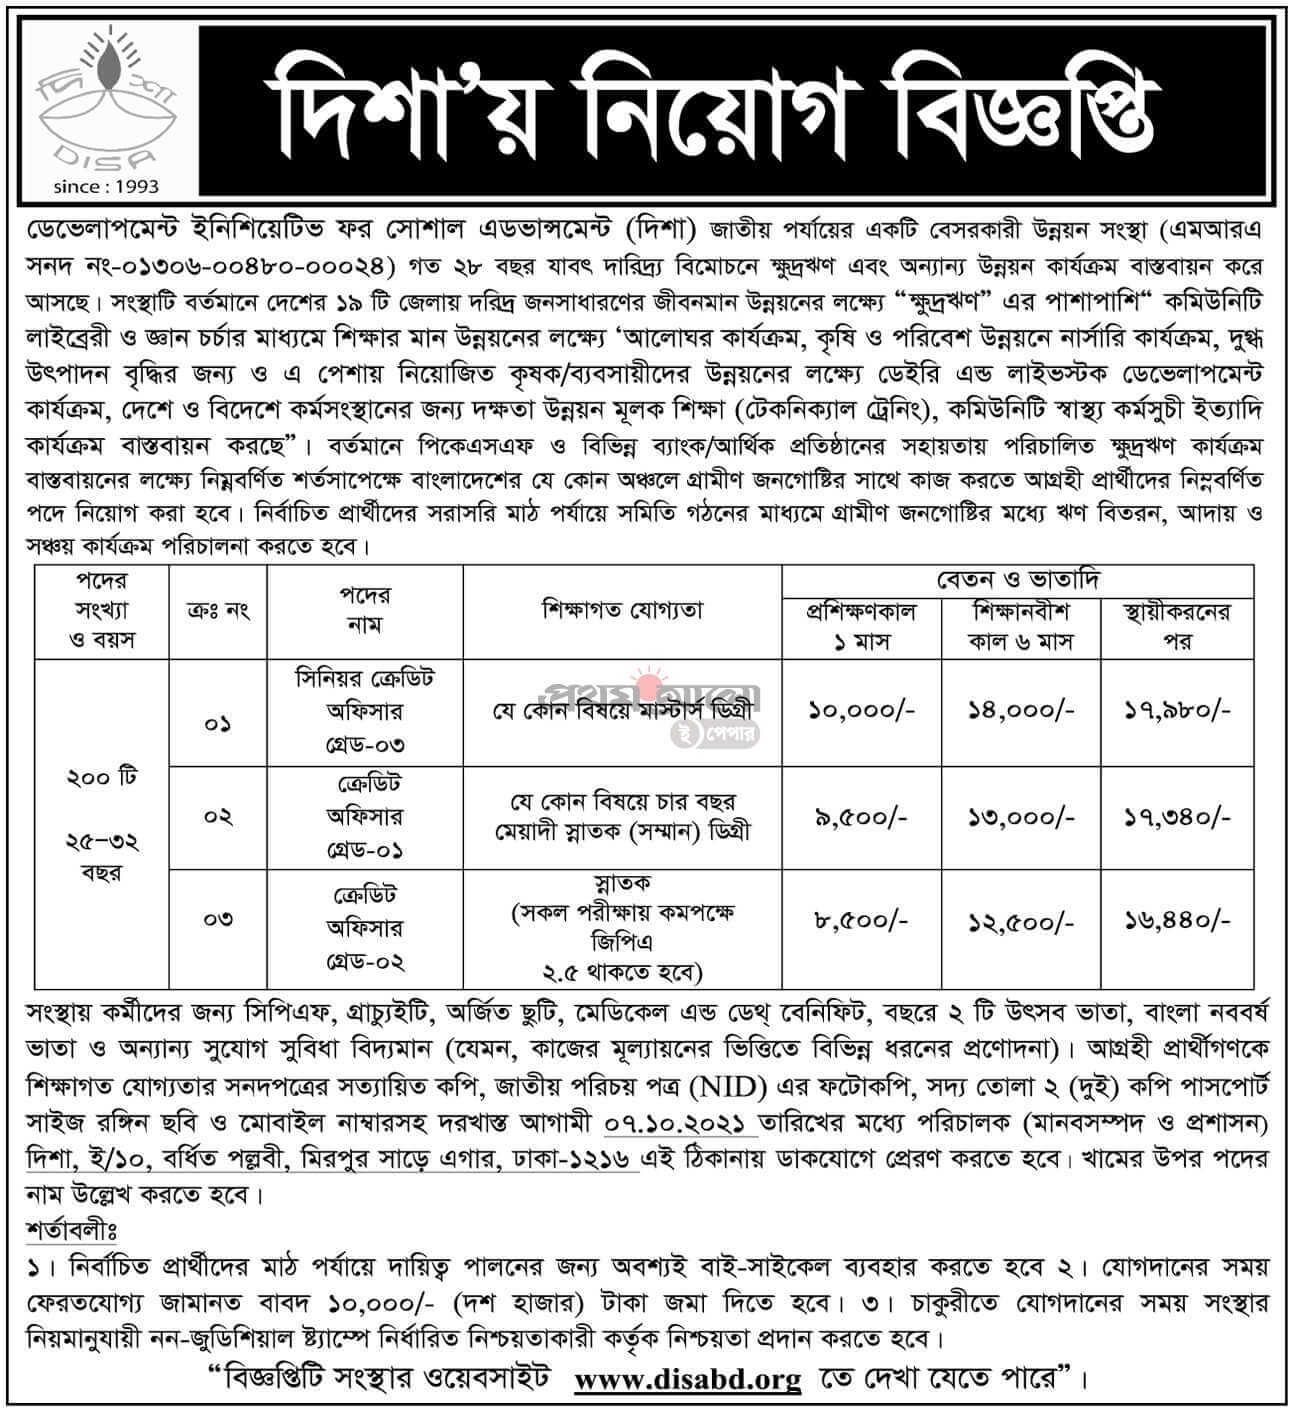 DISA NGO Job Circular image 2021